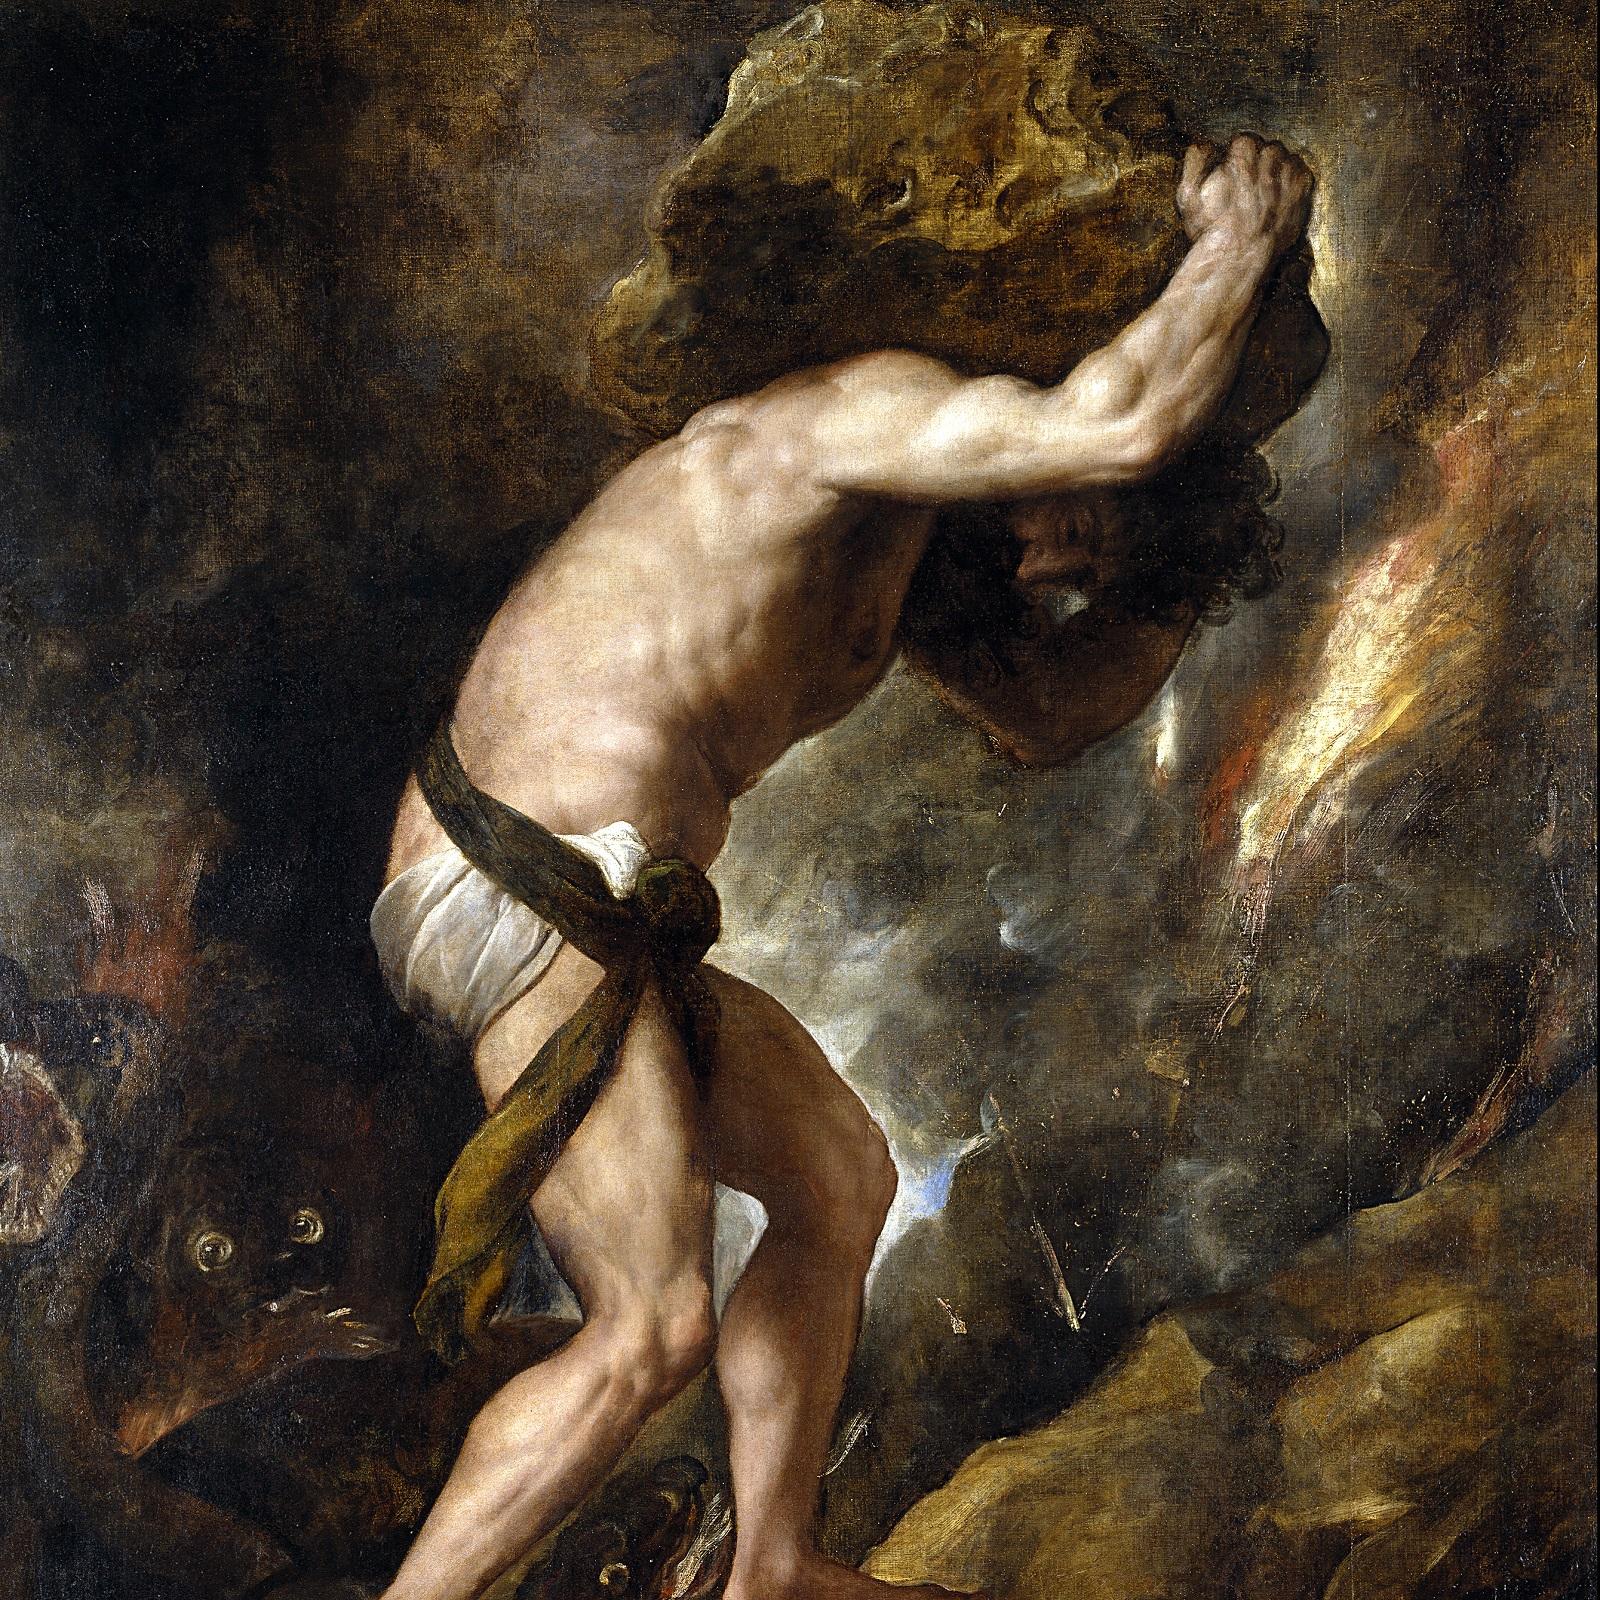 Episode 34 - A Sisyphean Task